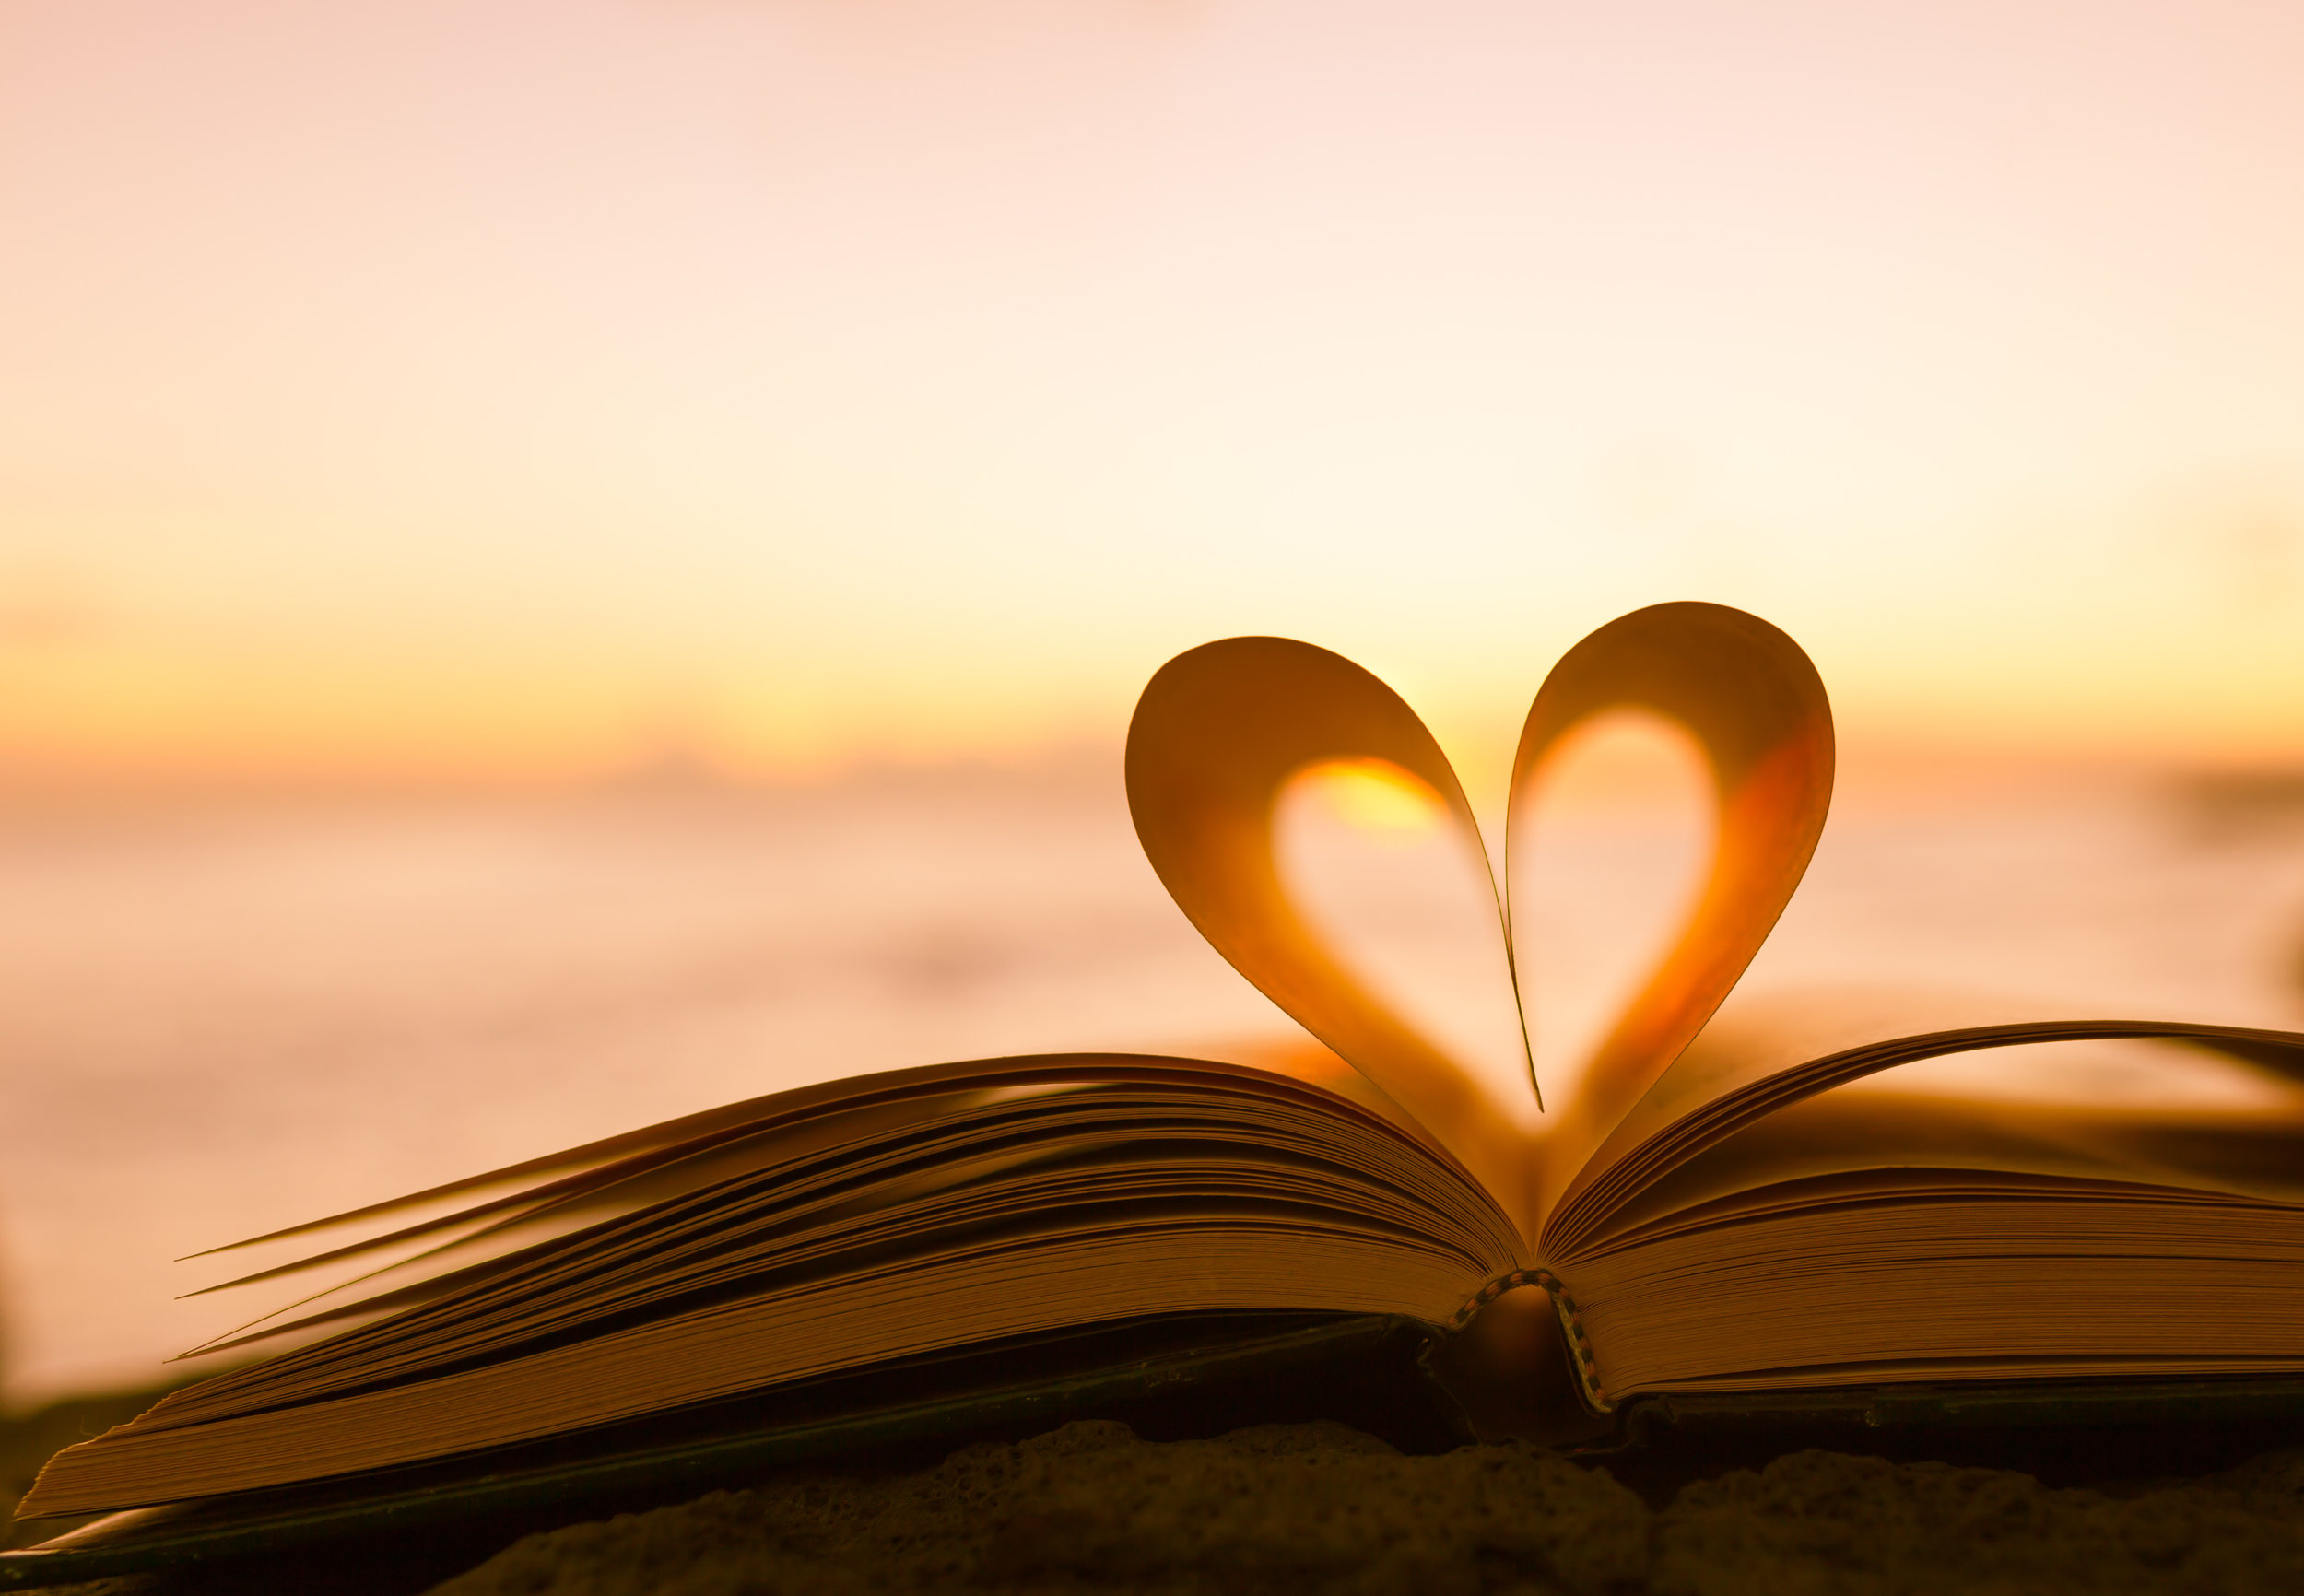 I love reading in summer or winter - Adobe stock Image # 99598608